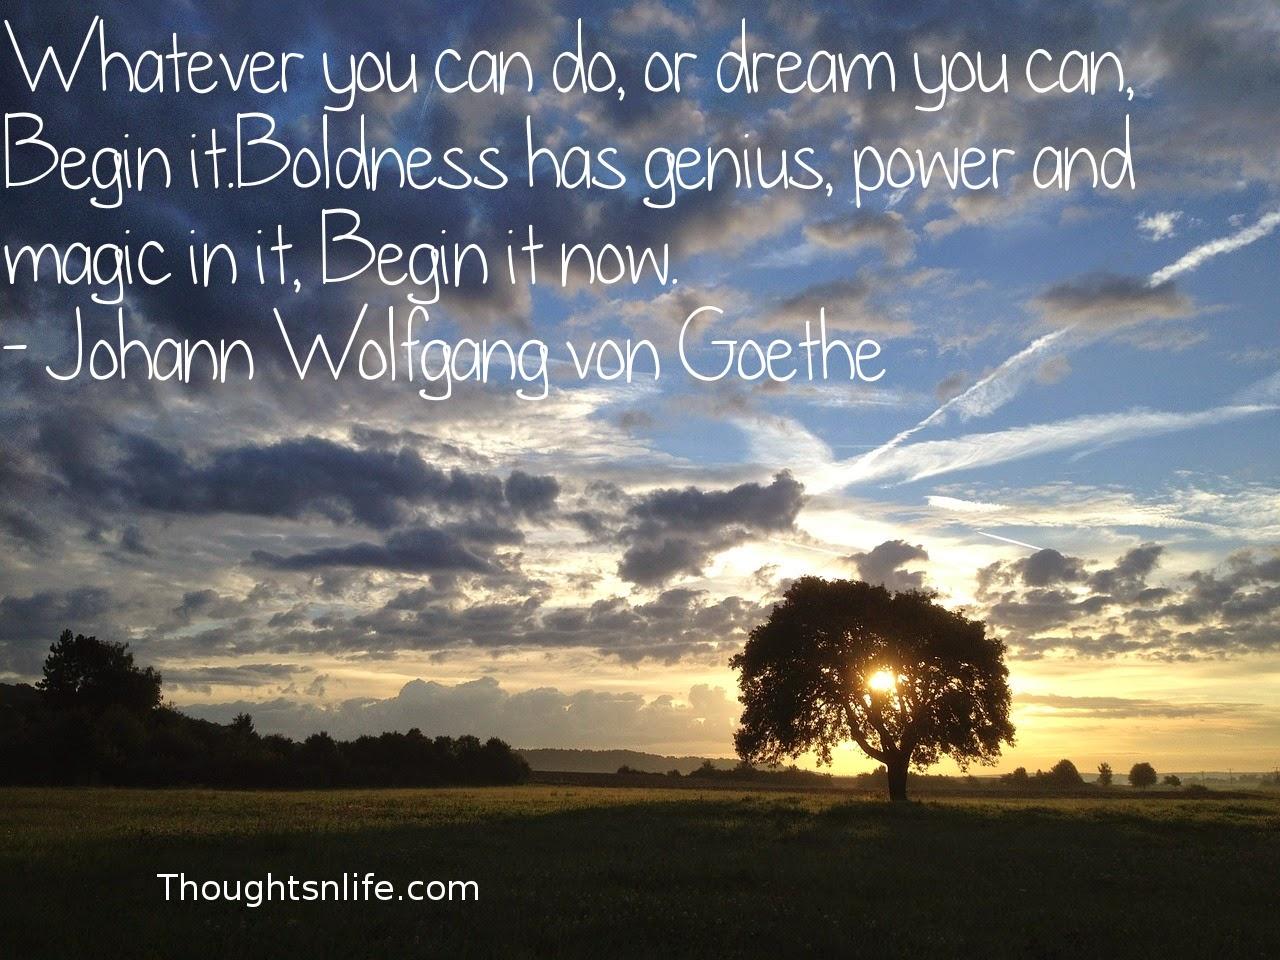 Dream-quotes-Begin-it-now